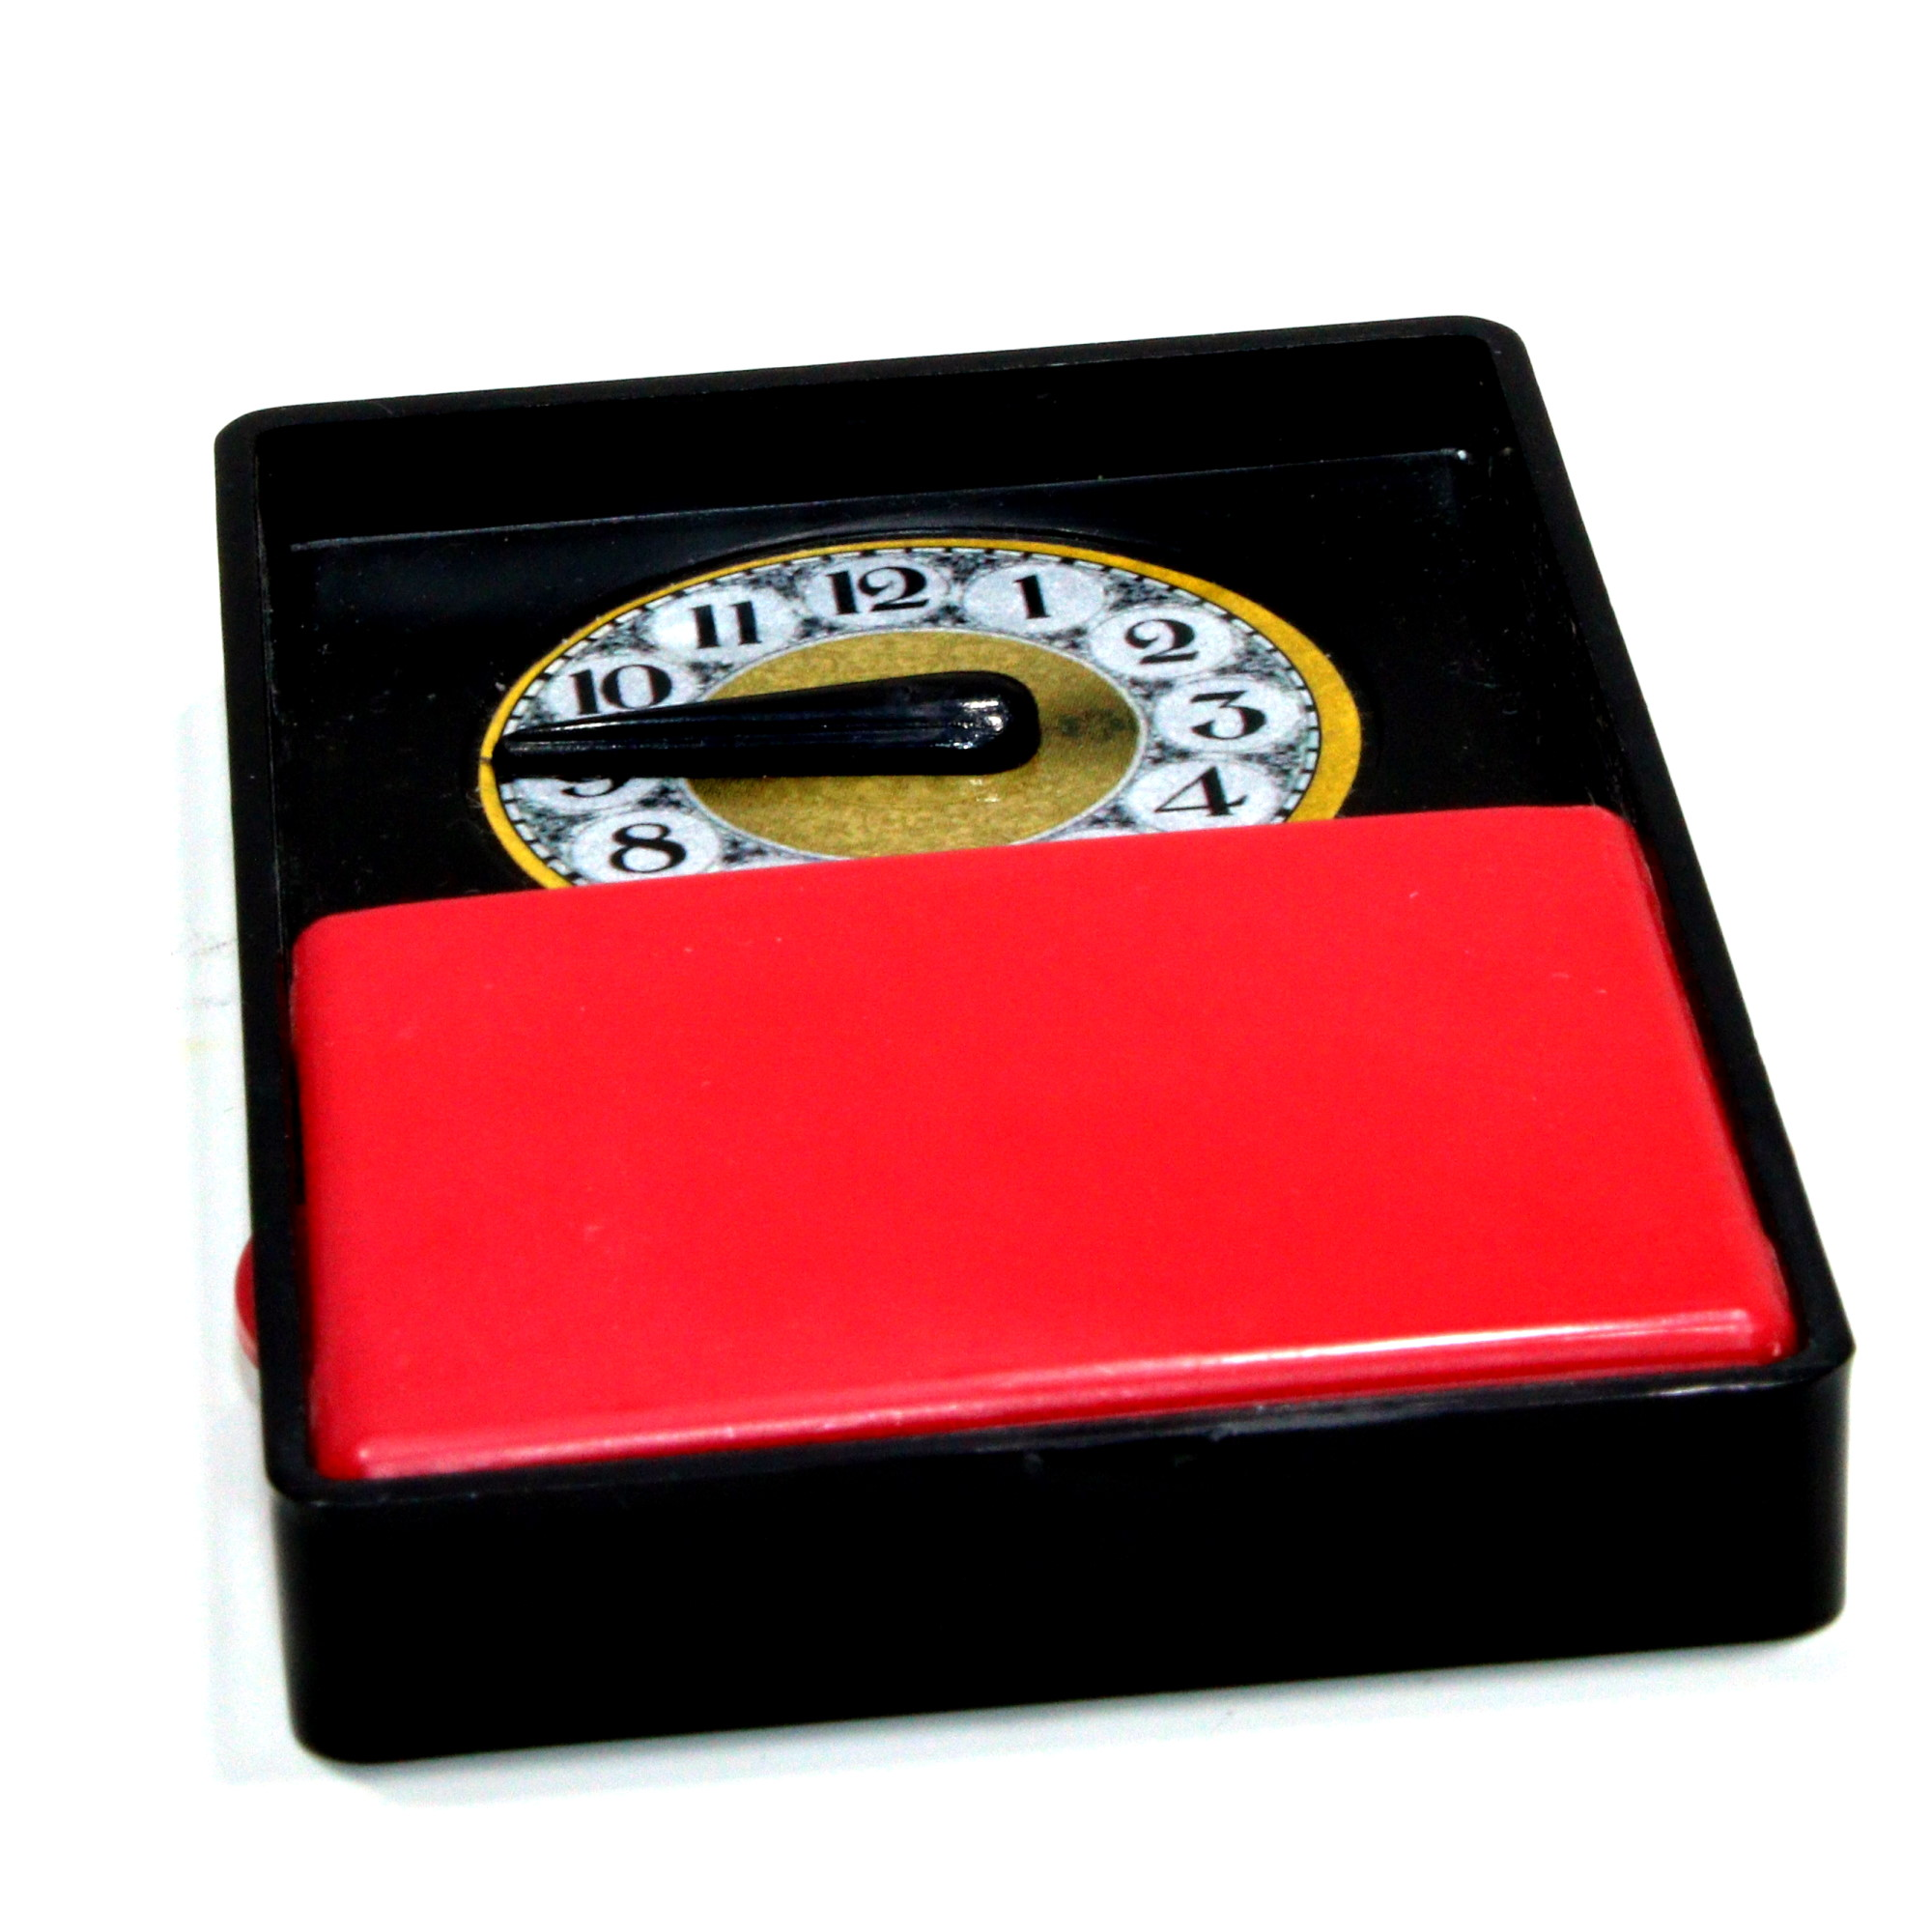 Time Machine (Wonder Clock) by Sam Dalal